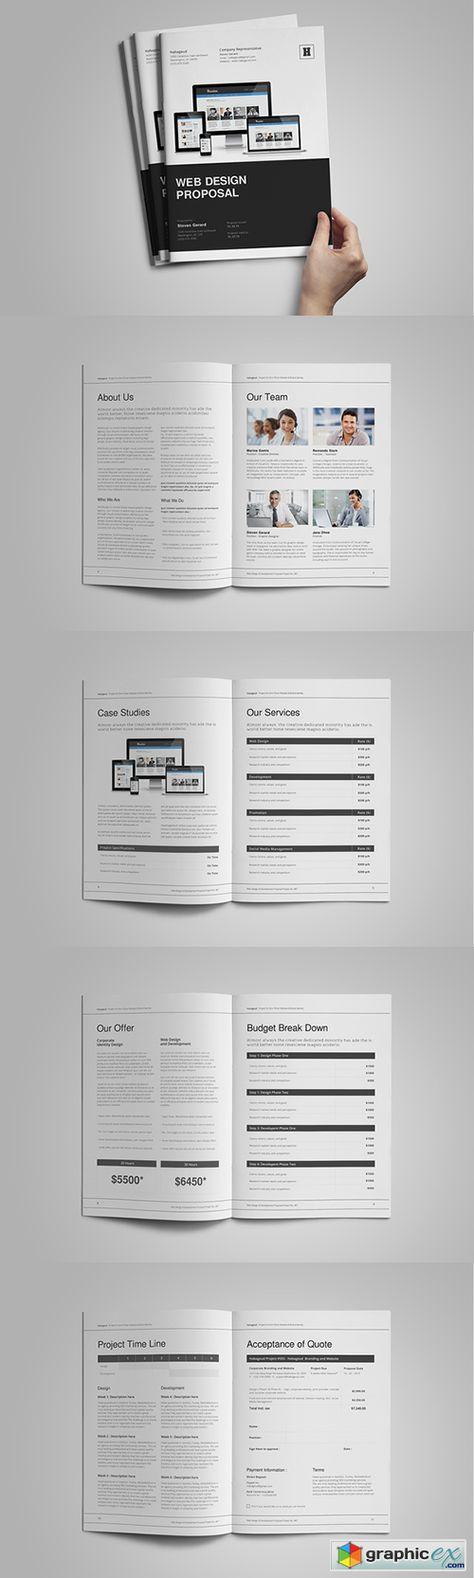 Web Design Proposal Template Pinterest Proposals, Vector - interior design proposal template